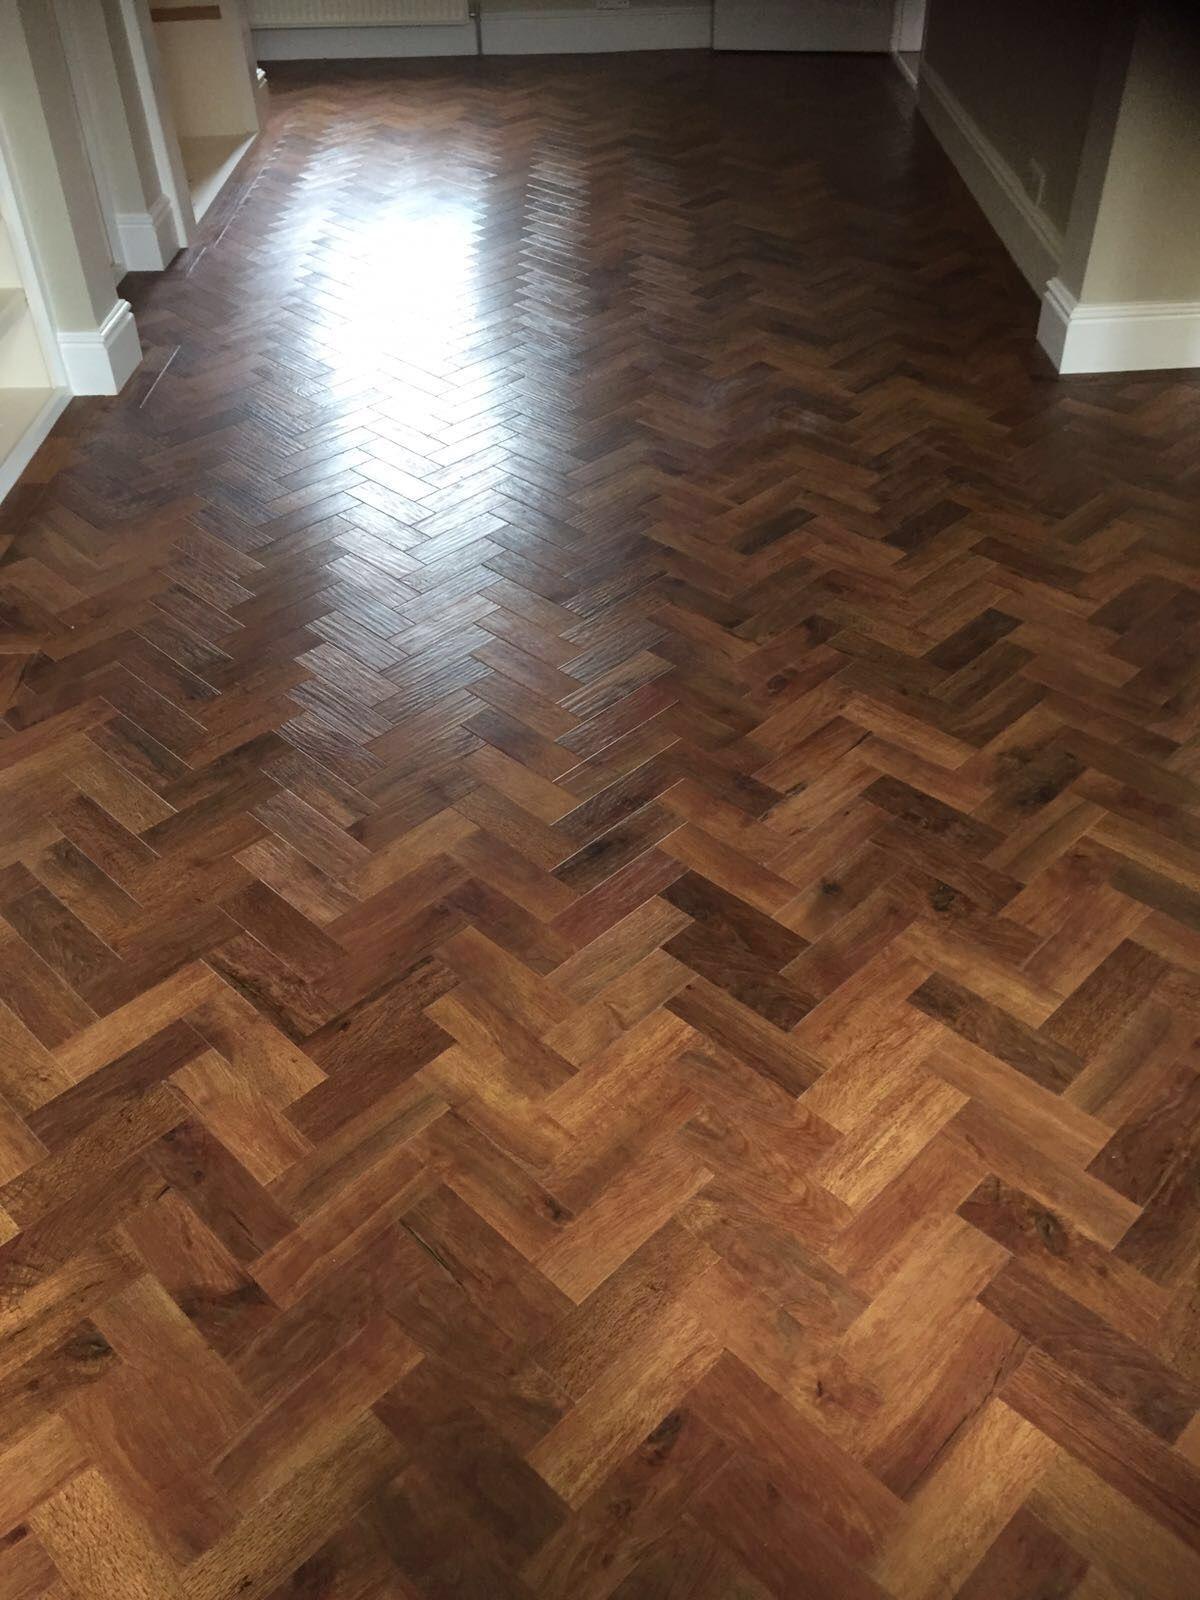 Karndean Art Select Auburn Oak Parquet Flooring Fitted By Pauls - Oak tree hardwood parquet flooring